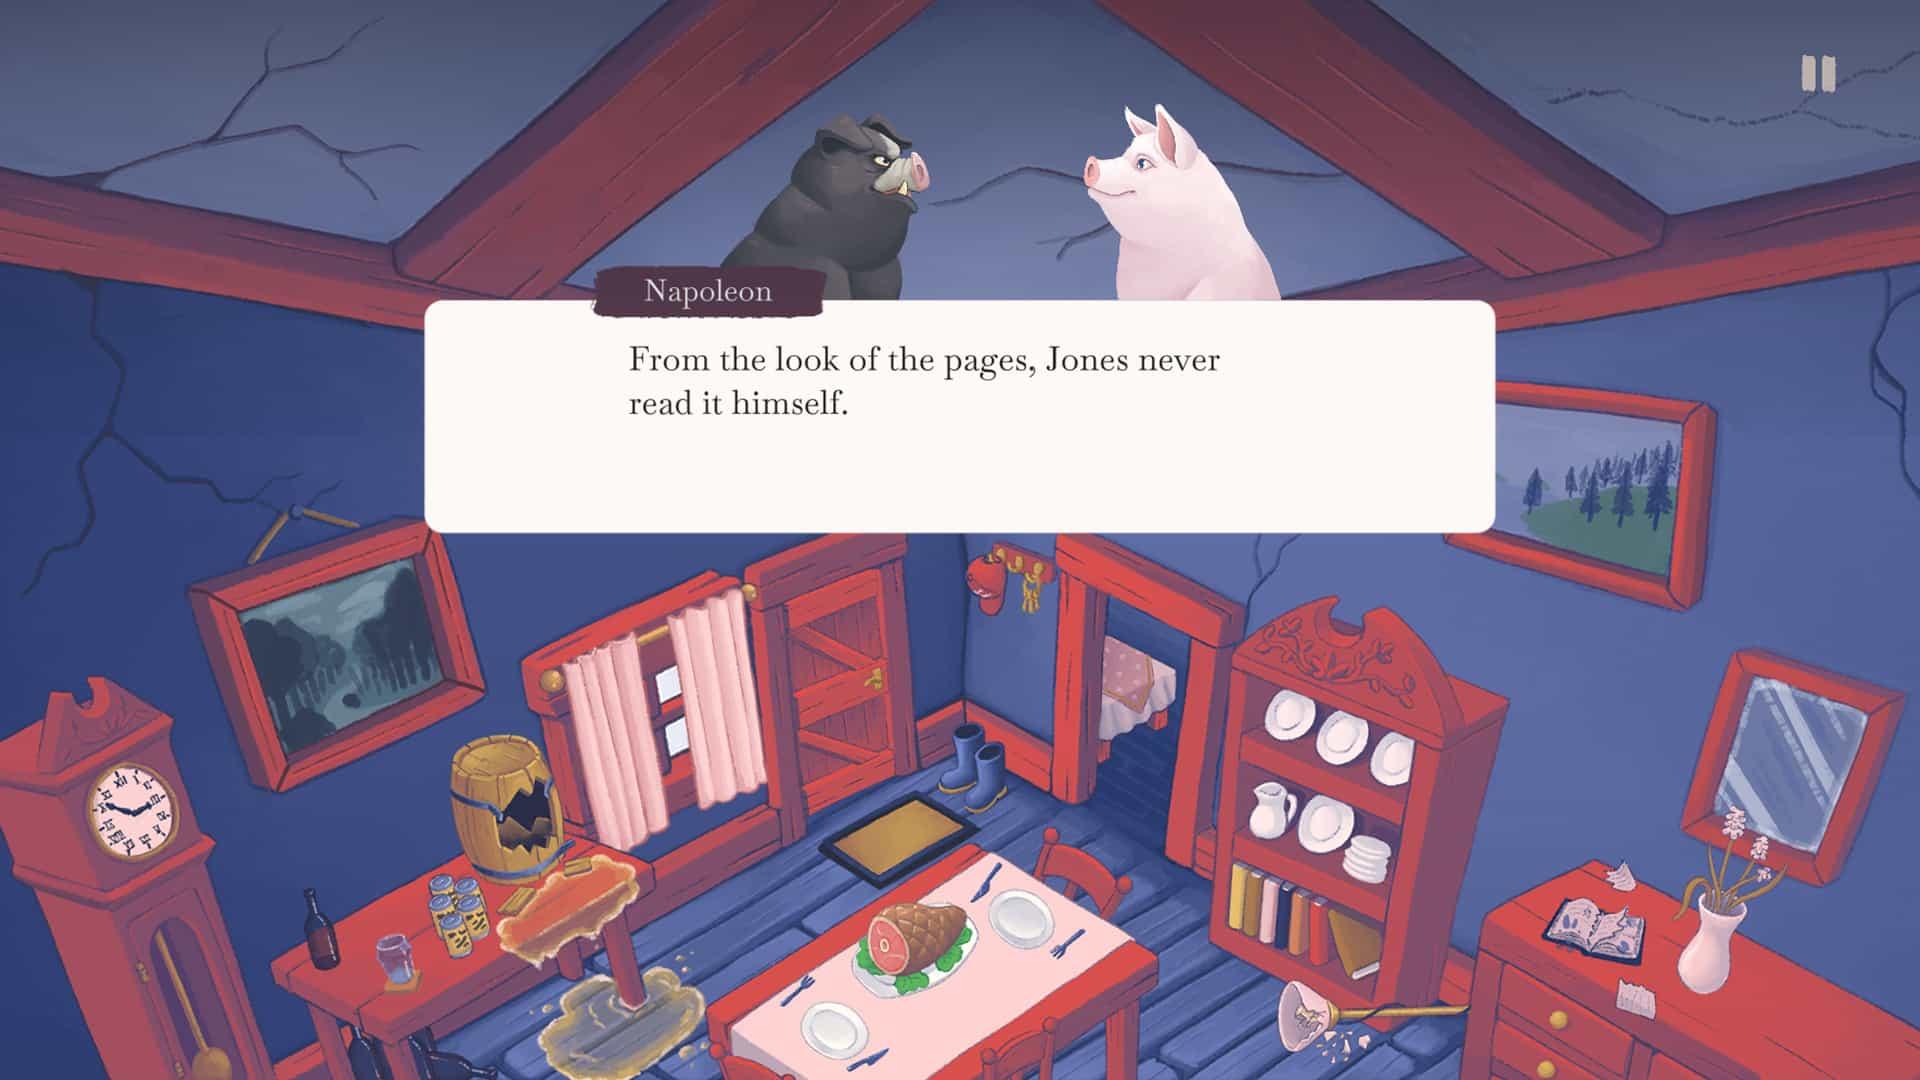 George Orwell Animal Farm adaptation video game politics Napoleon Imre Jele, Tamara Alliot, Emily Short Nerial Orwell's Animal Farm game